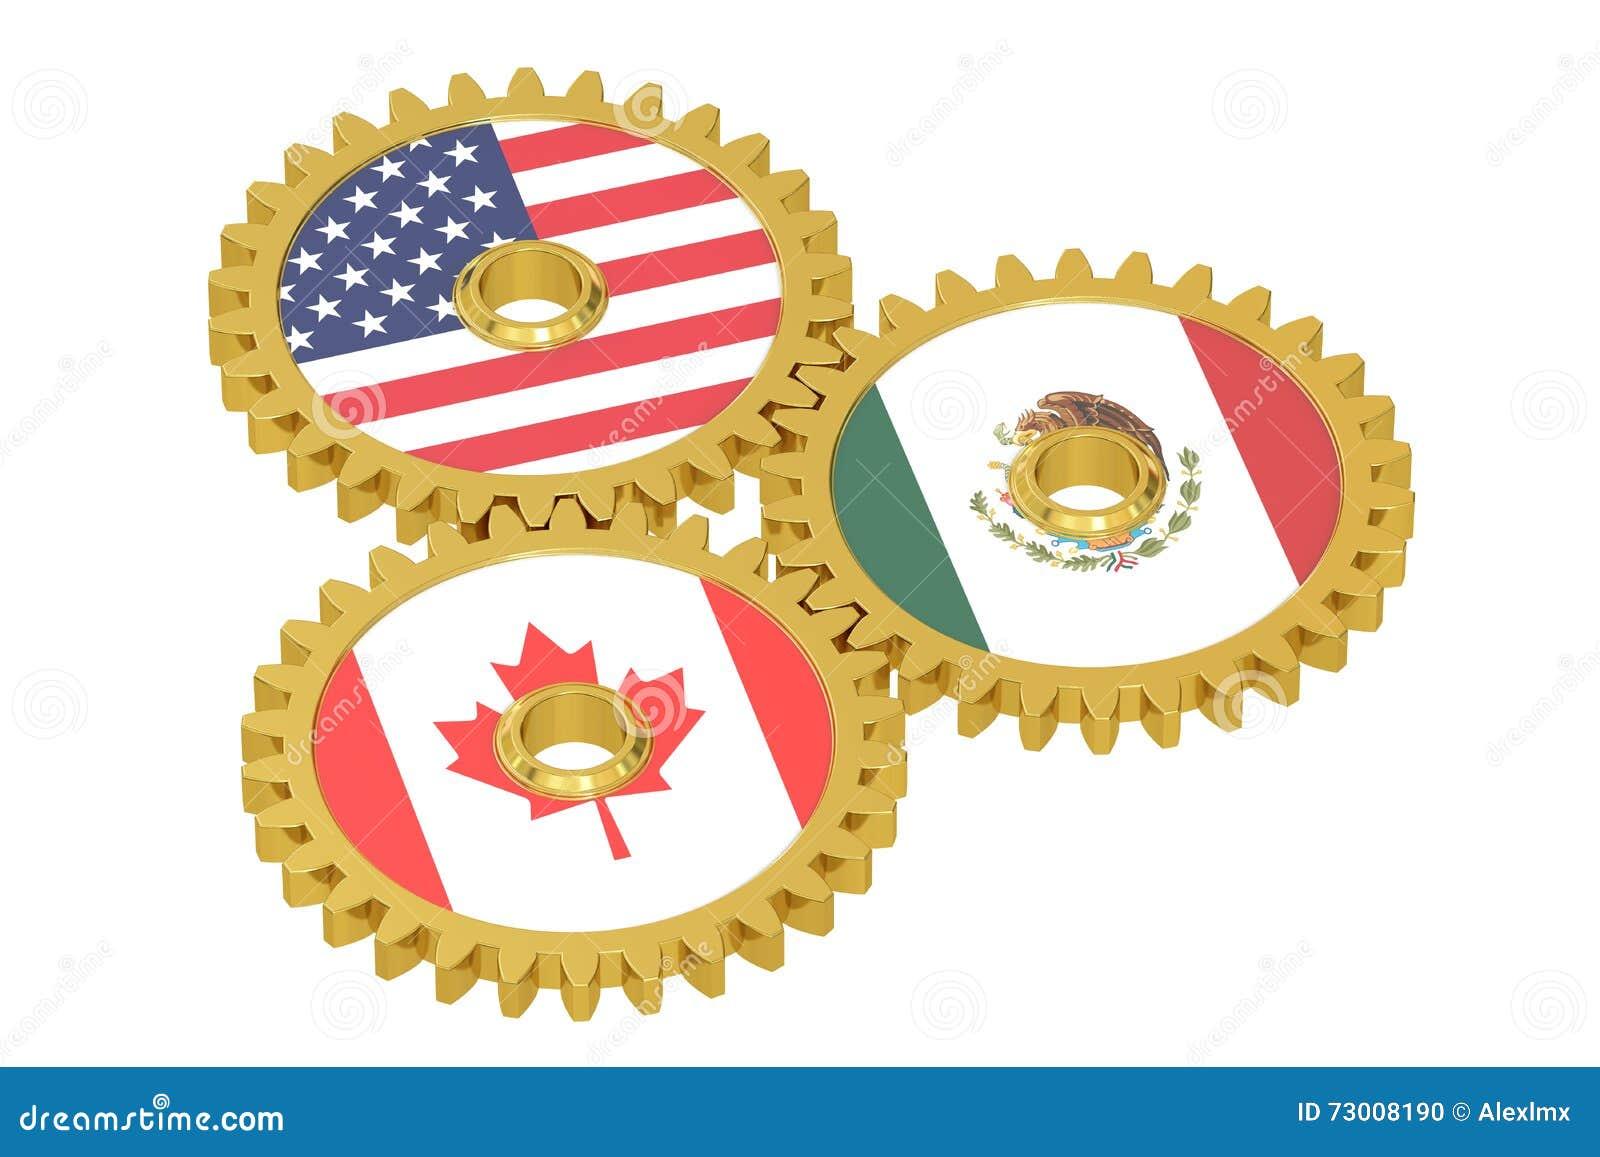 North American Union, NAU concept on a gears